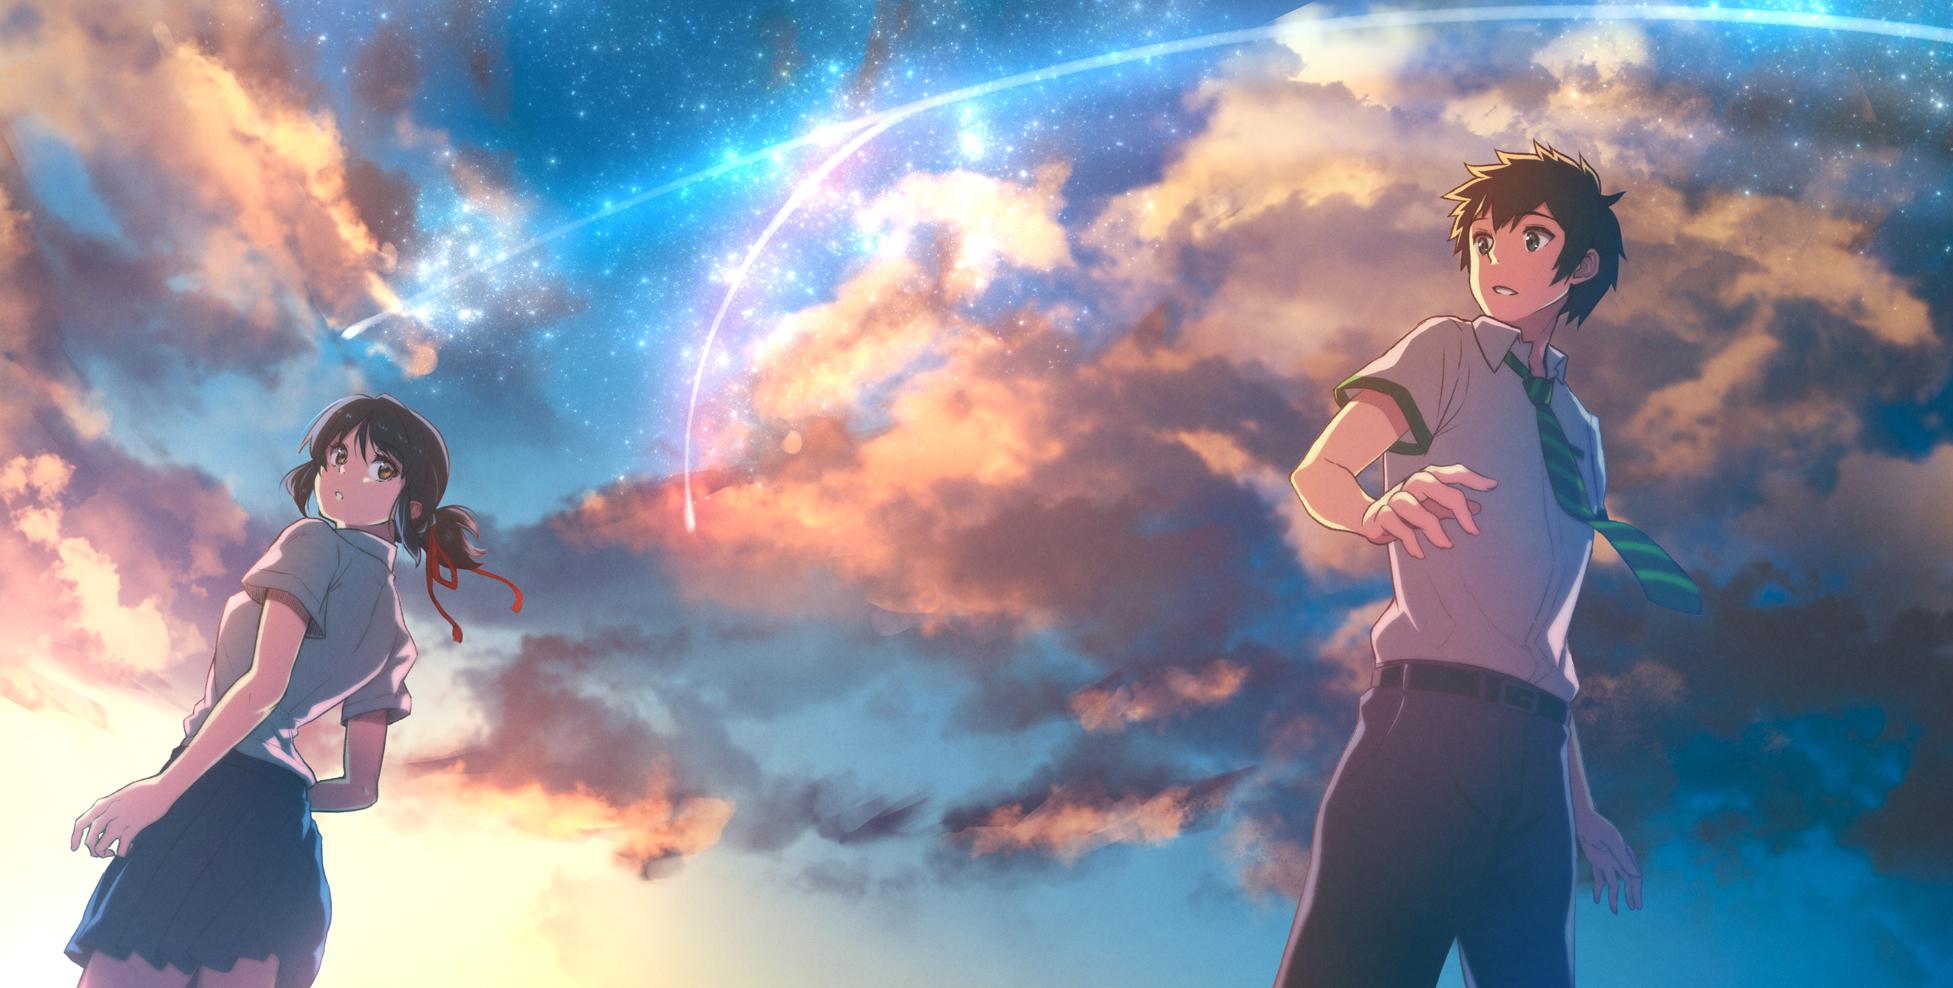 Download Kimi No Na Wa - Your Name Wallpaper 1080p , HD Wallpaper & Backgrounds